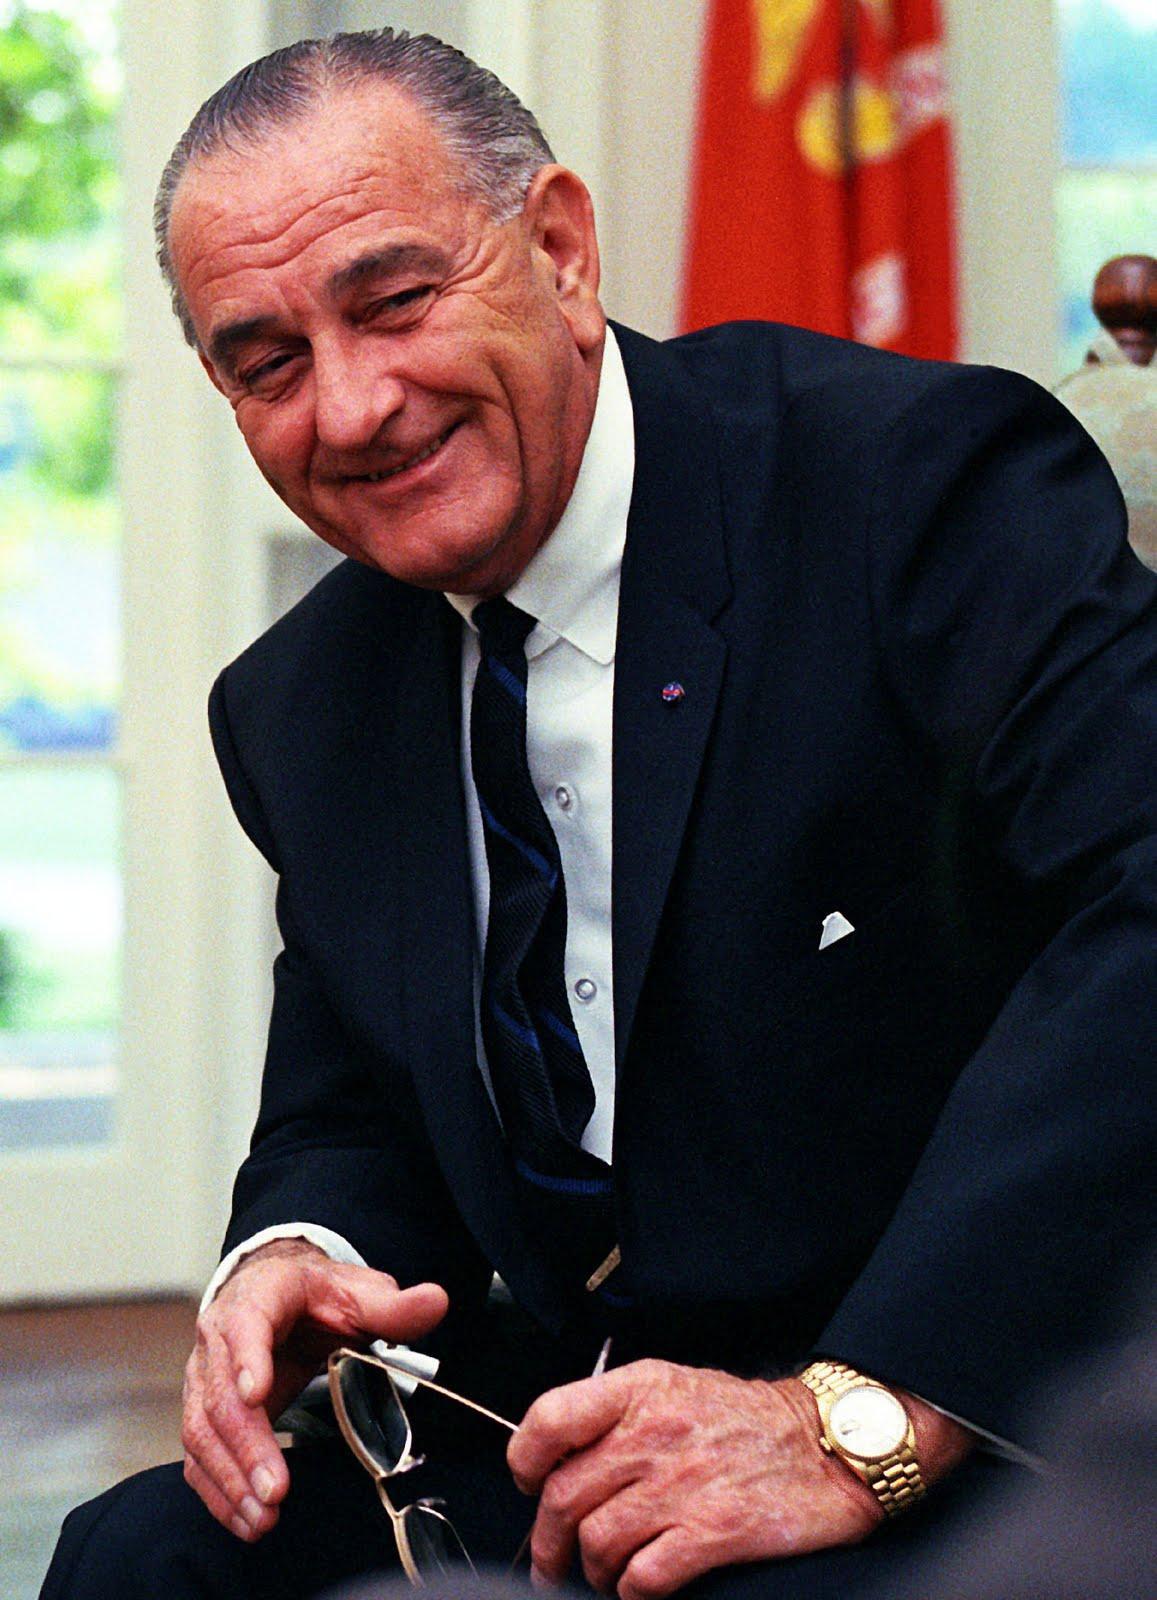 The First Watch: President Lyndon Johnson - Bob's Watches